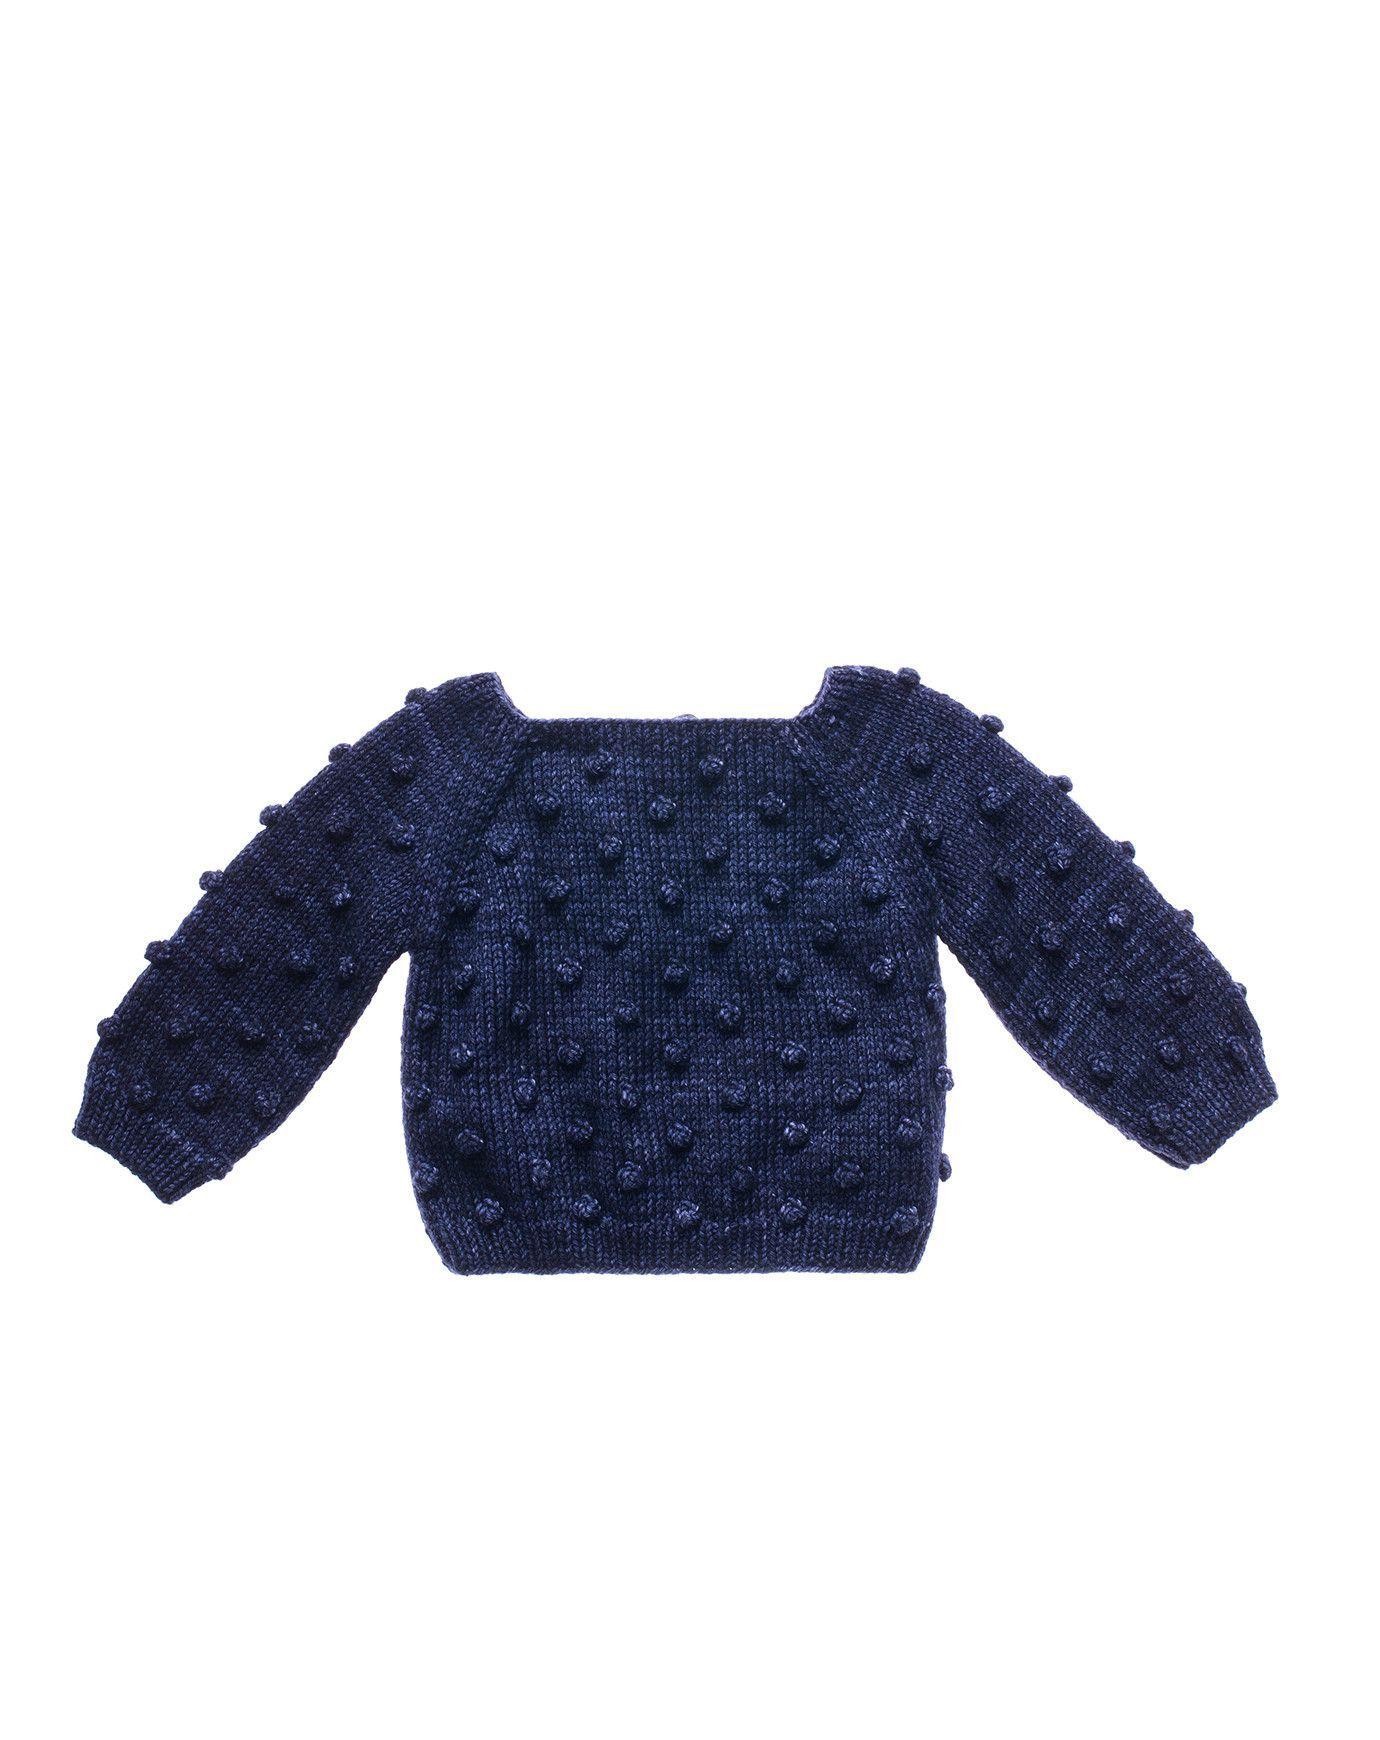 Misha and Puff Popcorn Sweater in Ink